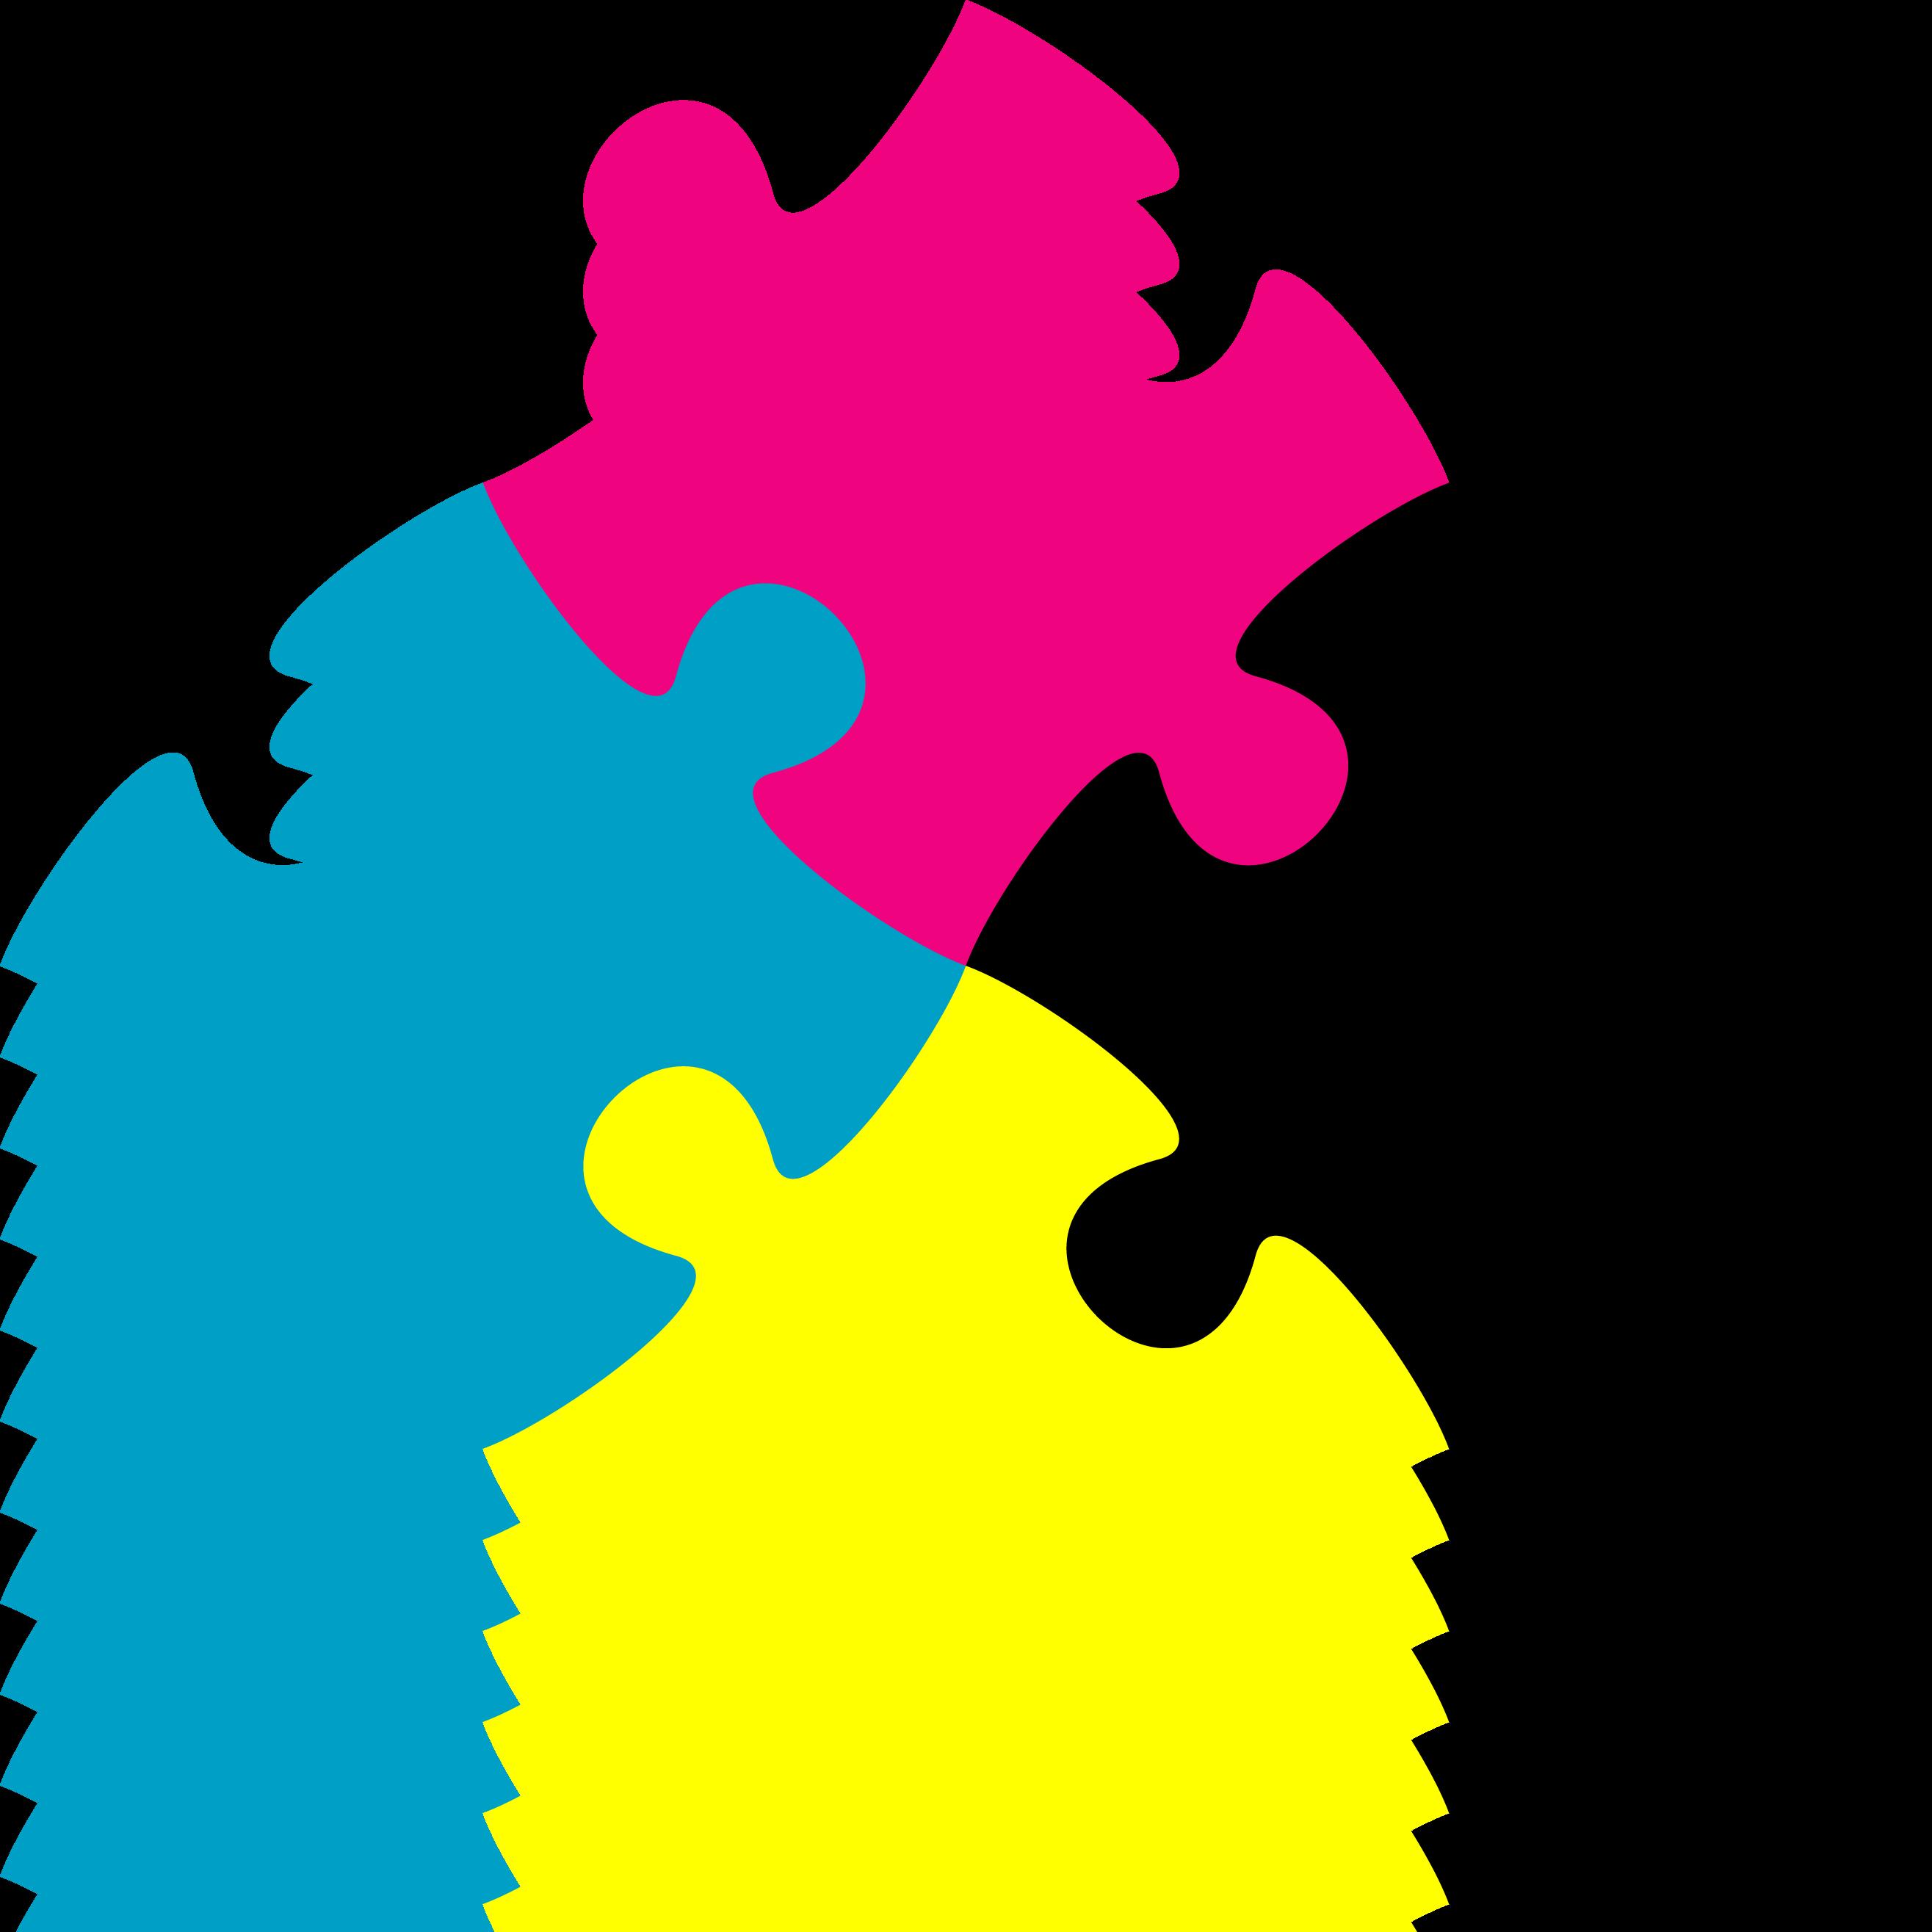 Jigsaw Puzzles Clip art.